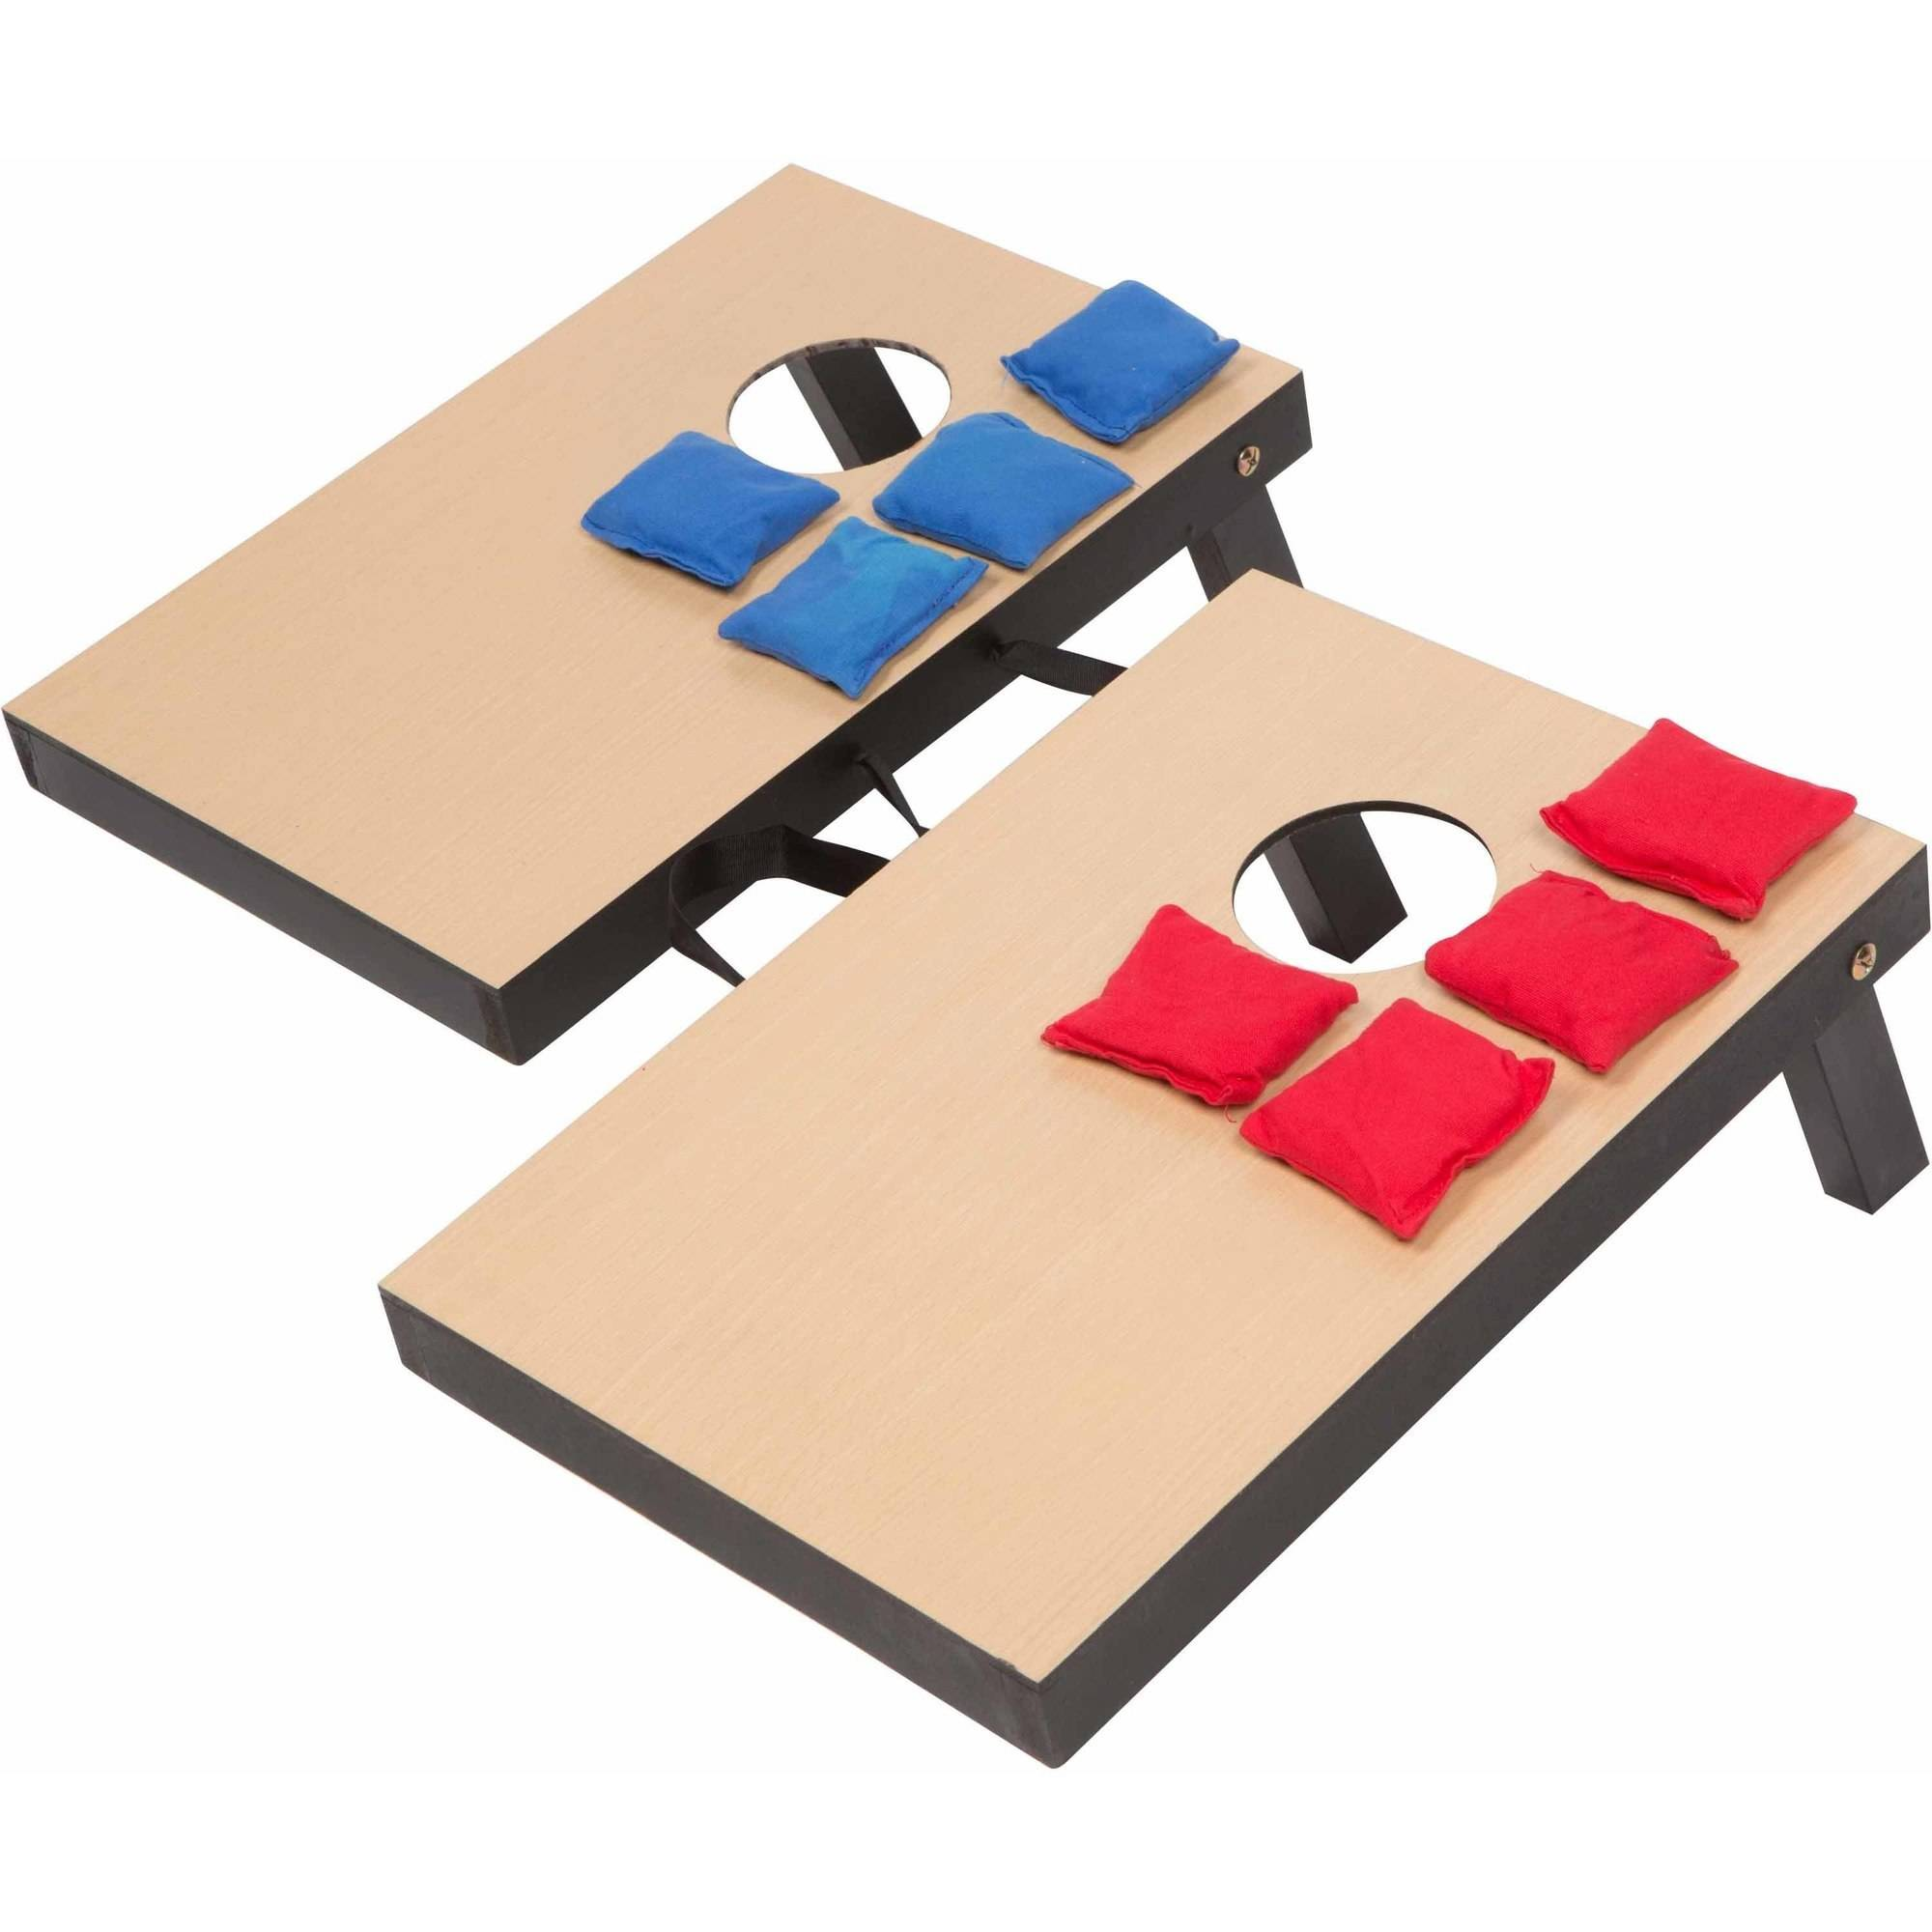 GoSports Cornhole Bean Bag Set (4 Red, 4 Blue) Official ... |Corn Hole Bean Bags